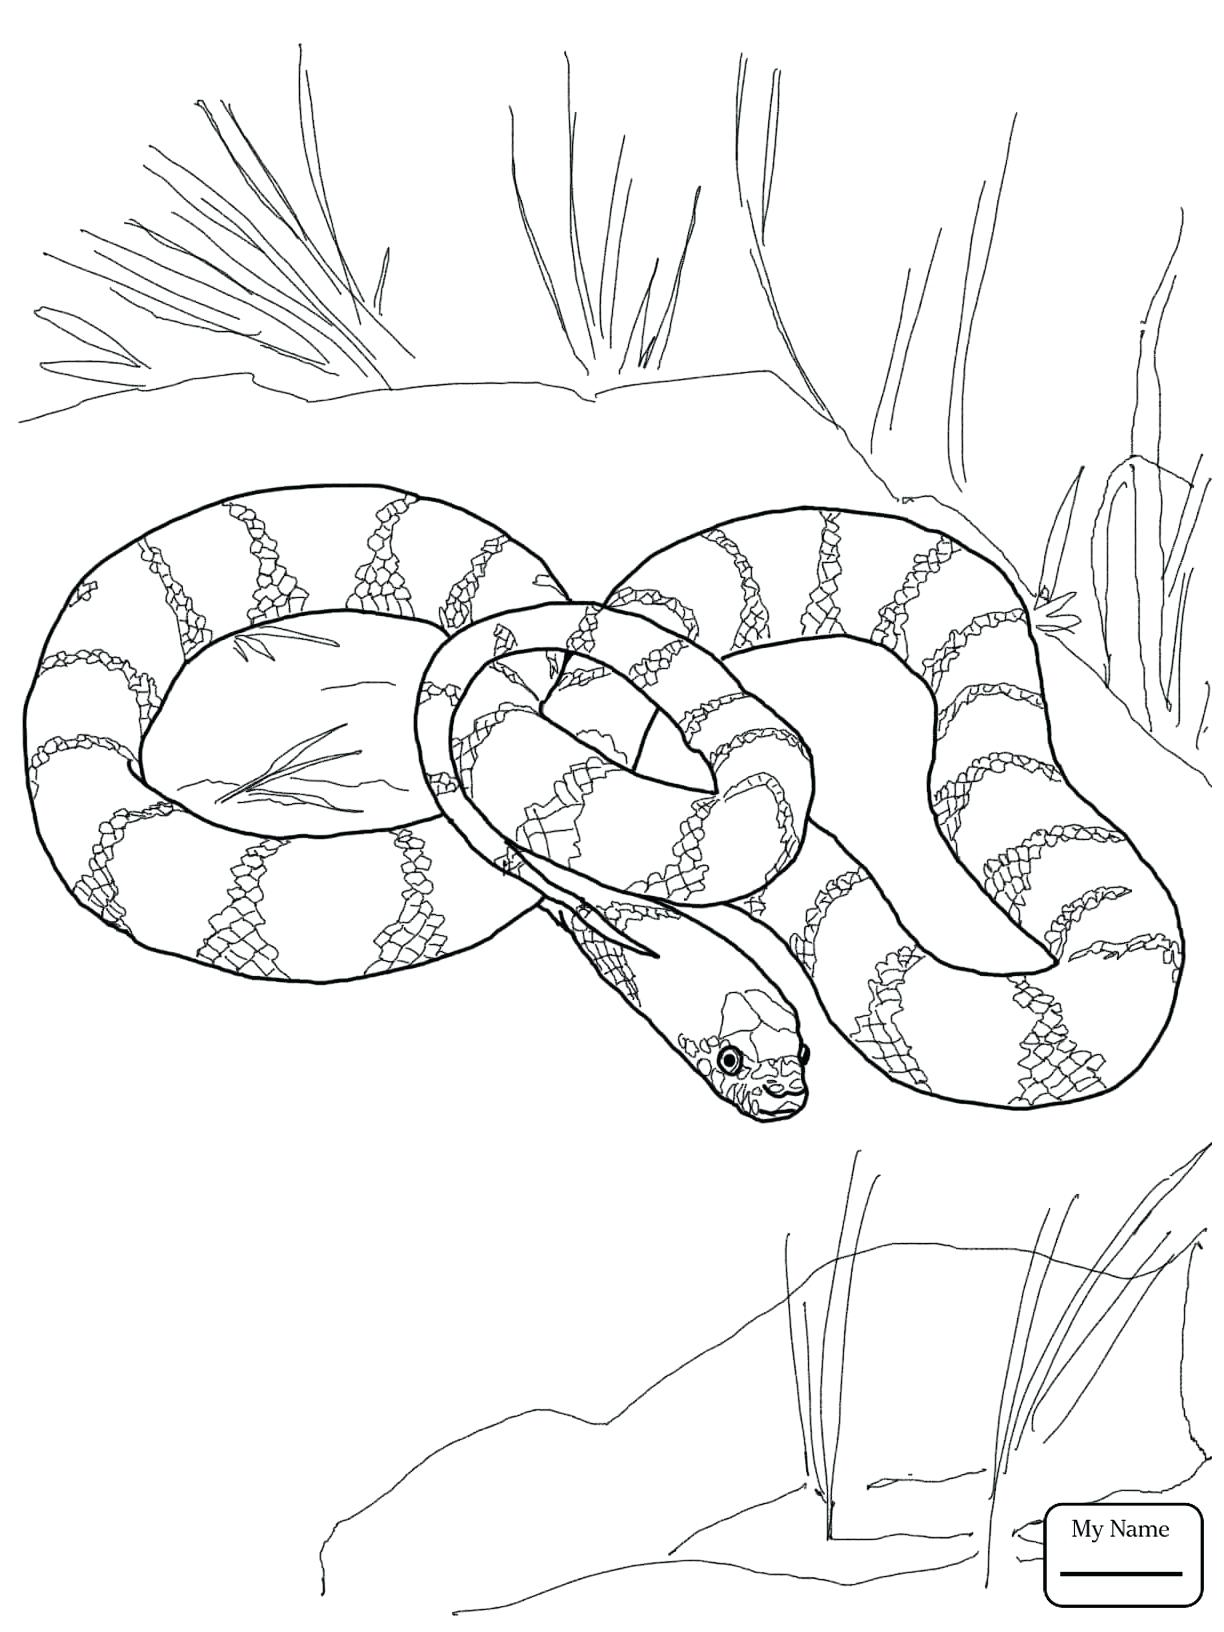 1224x1632 Coloring Anaconda Coloring Page Black And White. Anaconda